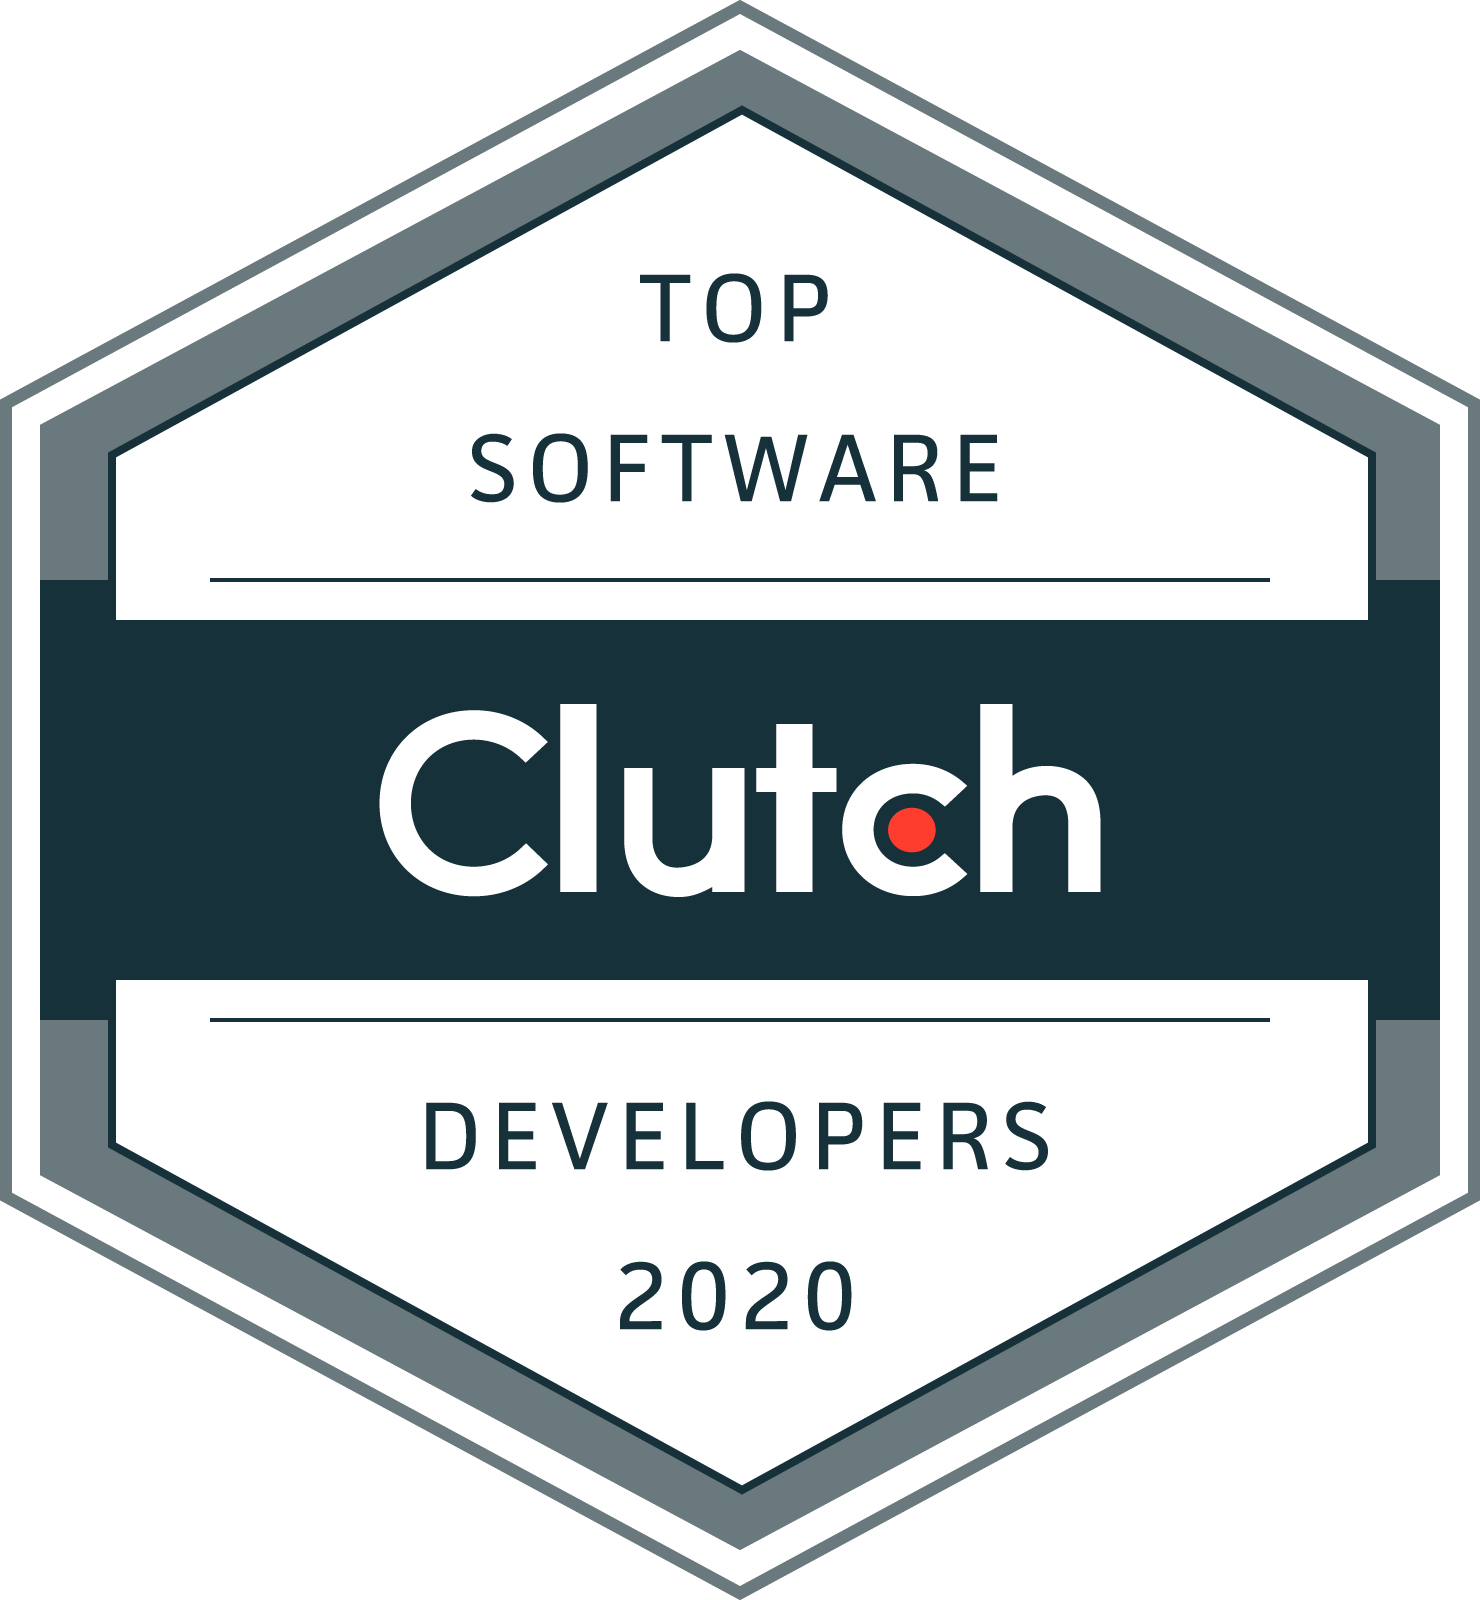 Clutch Award 1 - Themascc.com